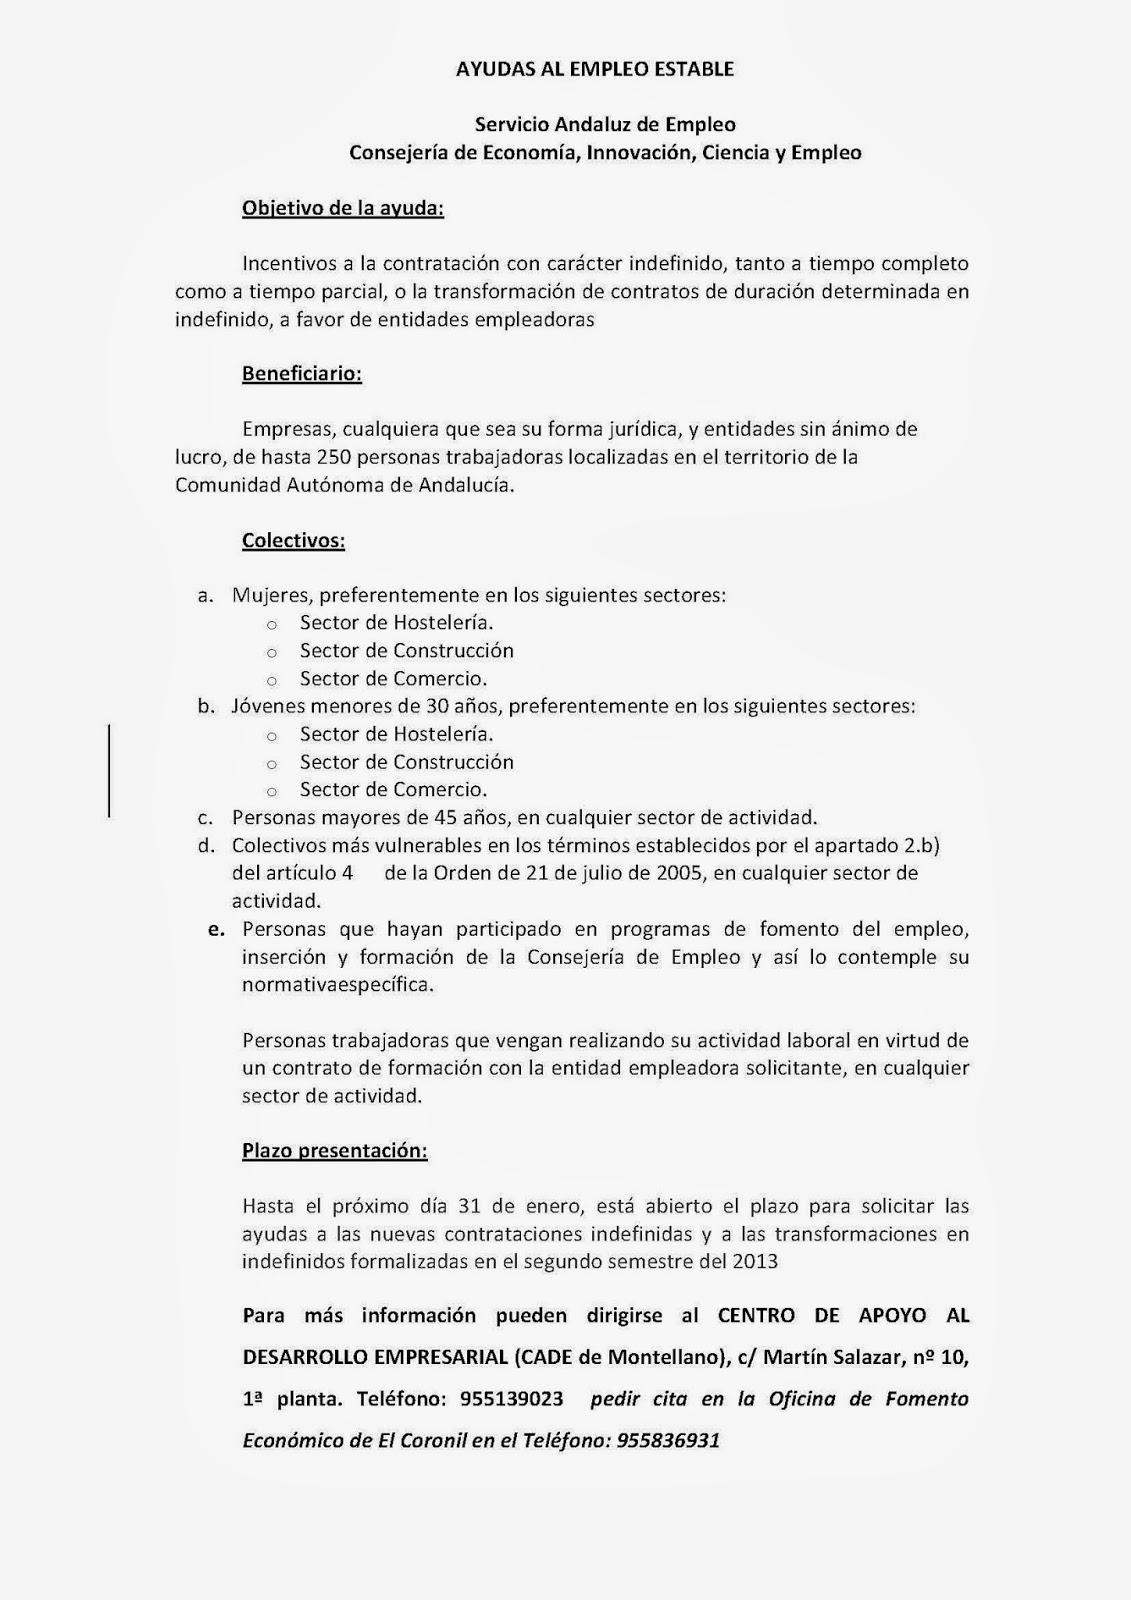 Ofe #ElCoronil (Sevilla): 2014